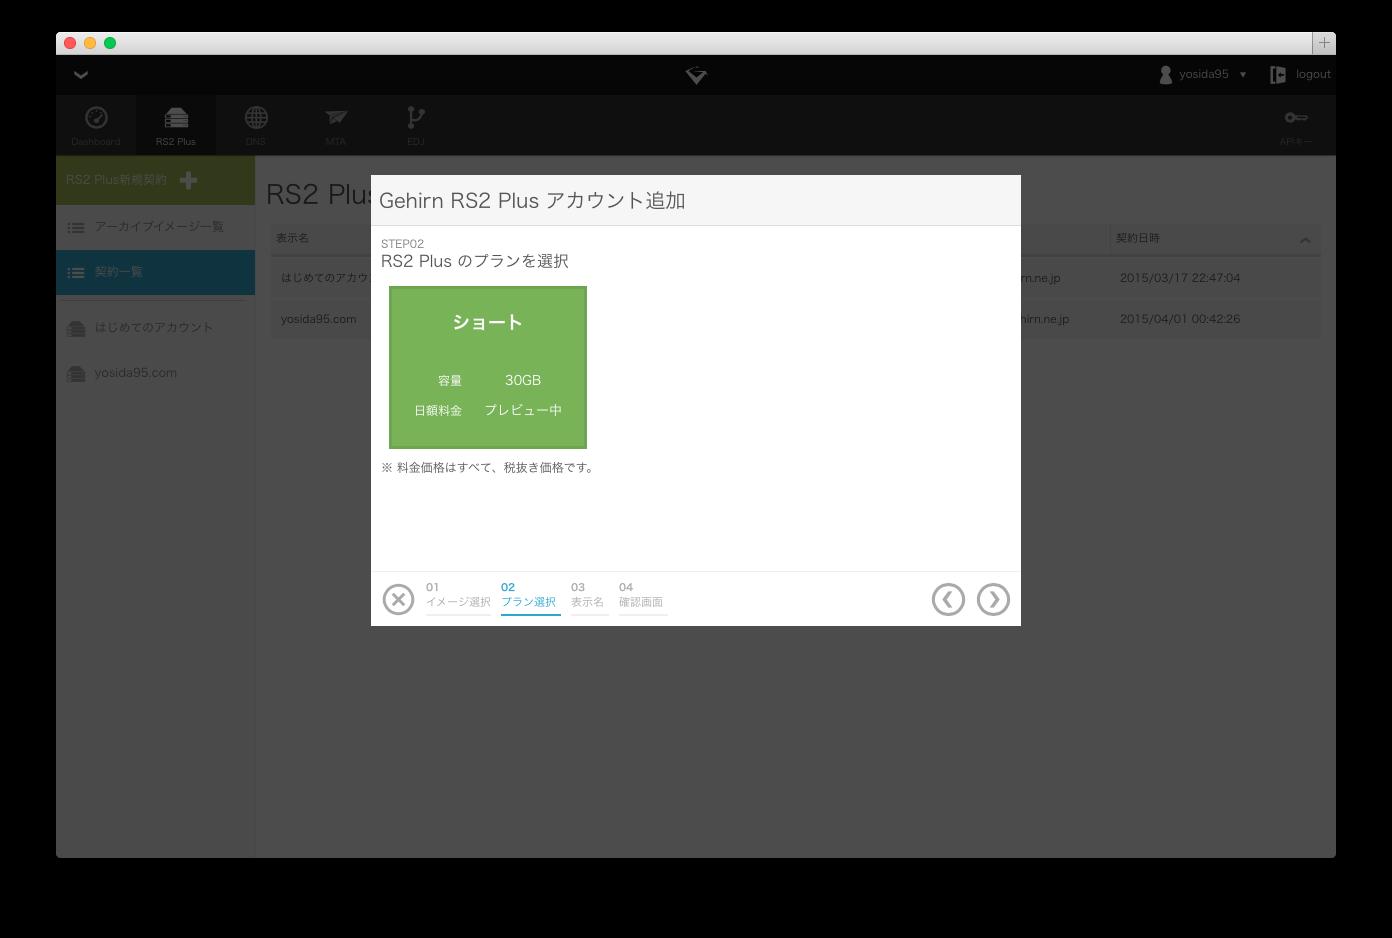 Gehirn RS2 Plus 新規アカウント作成 step2